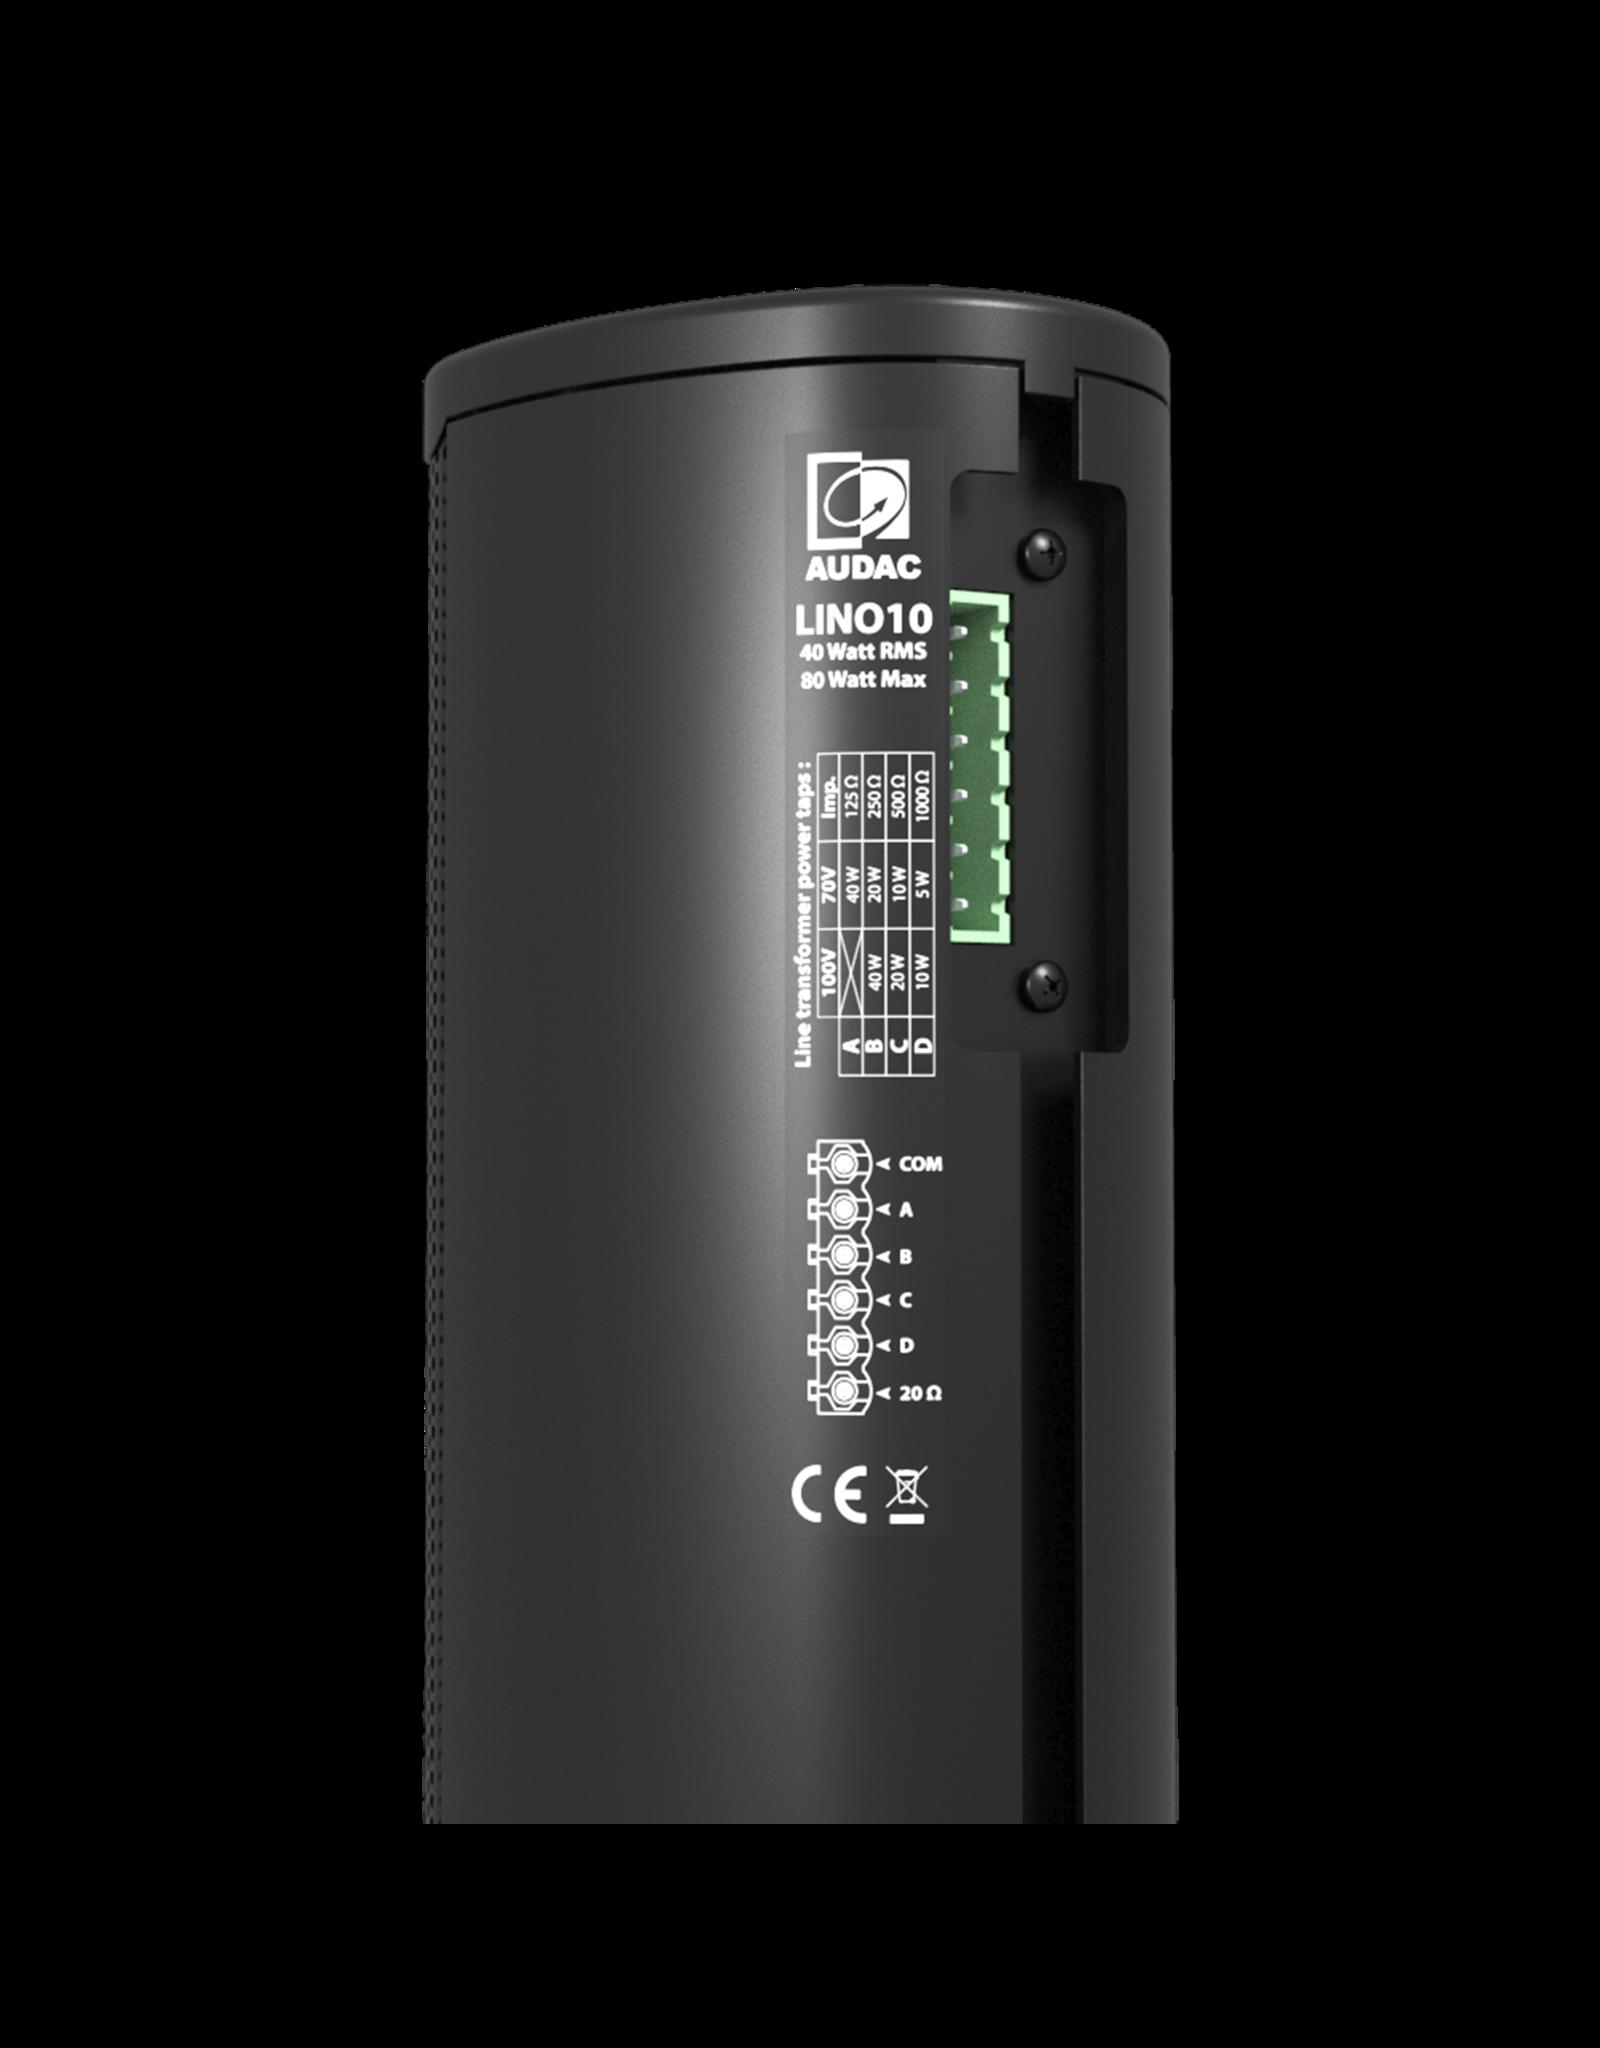 "Audac Column speaker 10 x 2"" Black version"